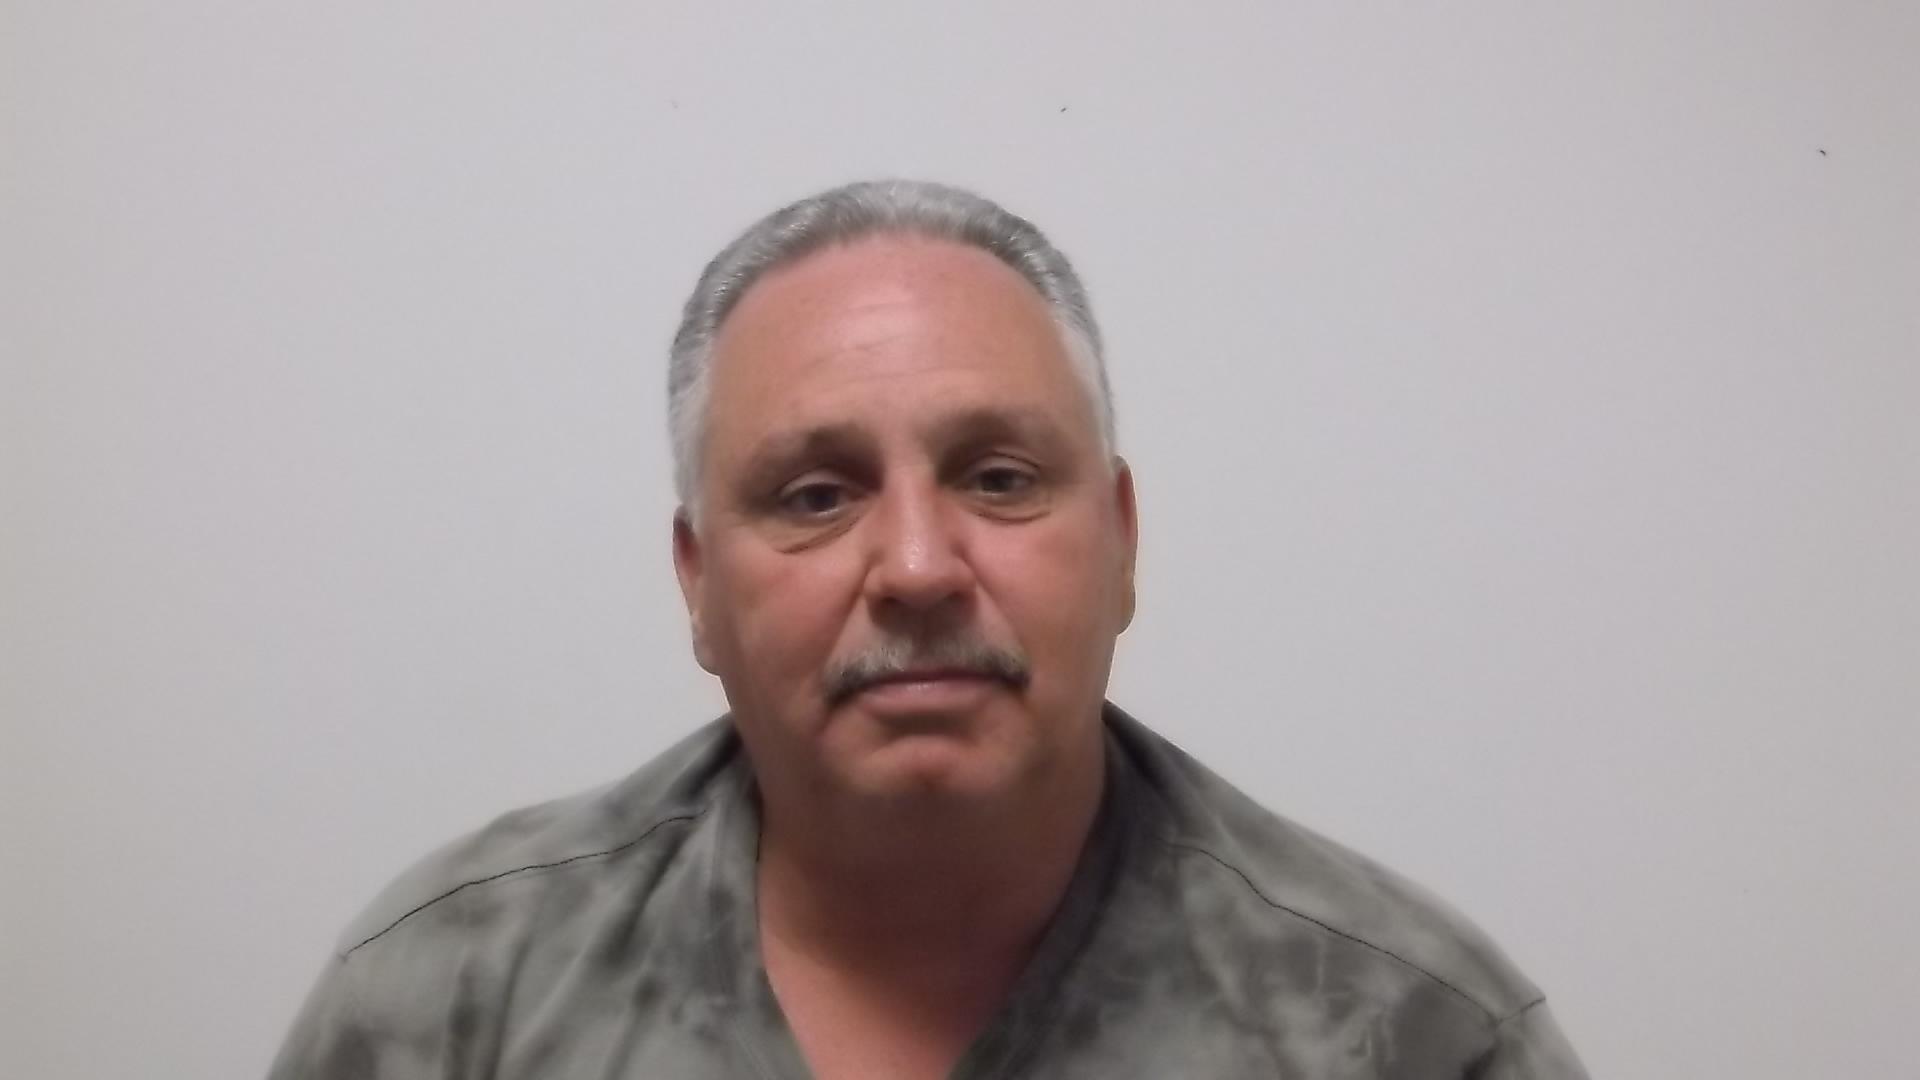 kentucky offender registry search sex